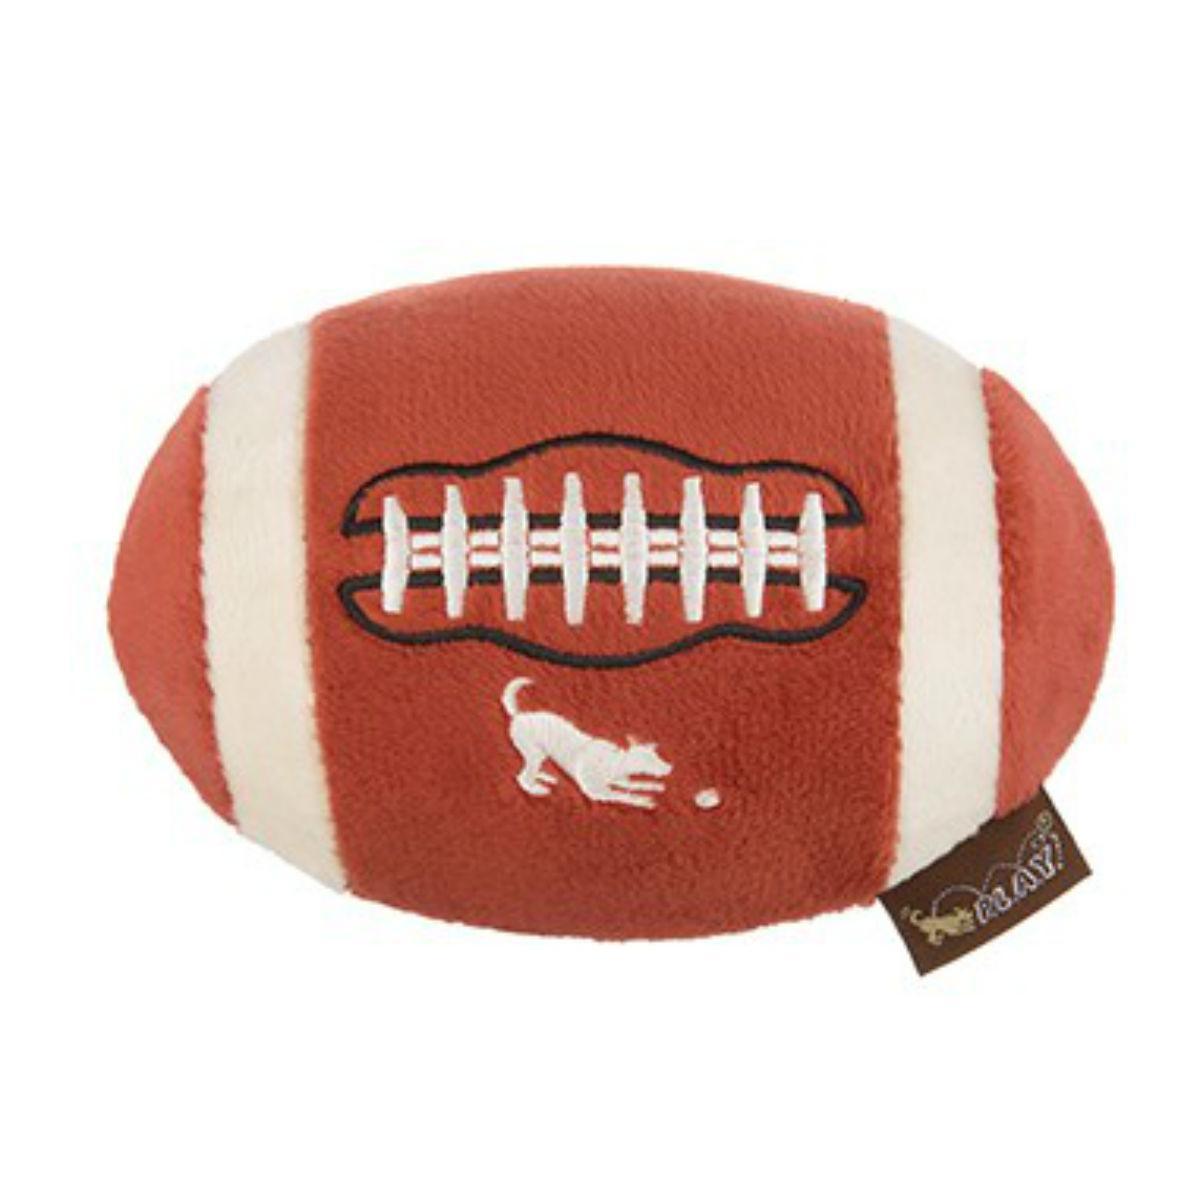 P.L.A.Y. Back to School Dog Toy - Football